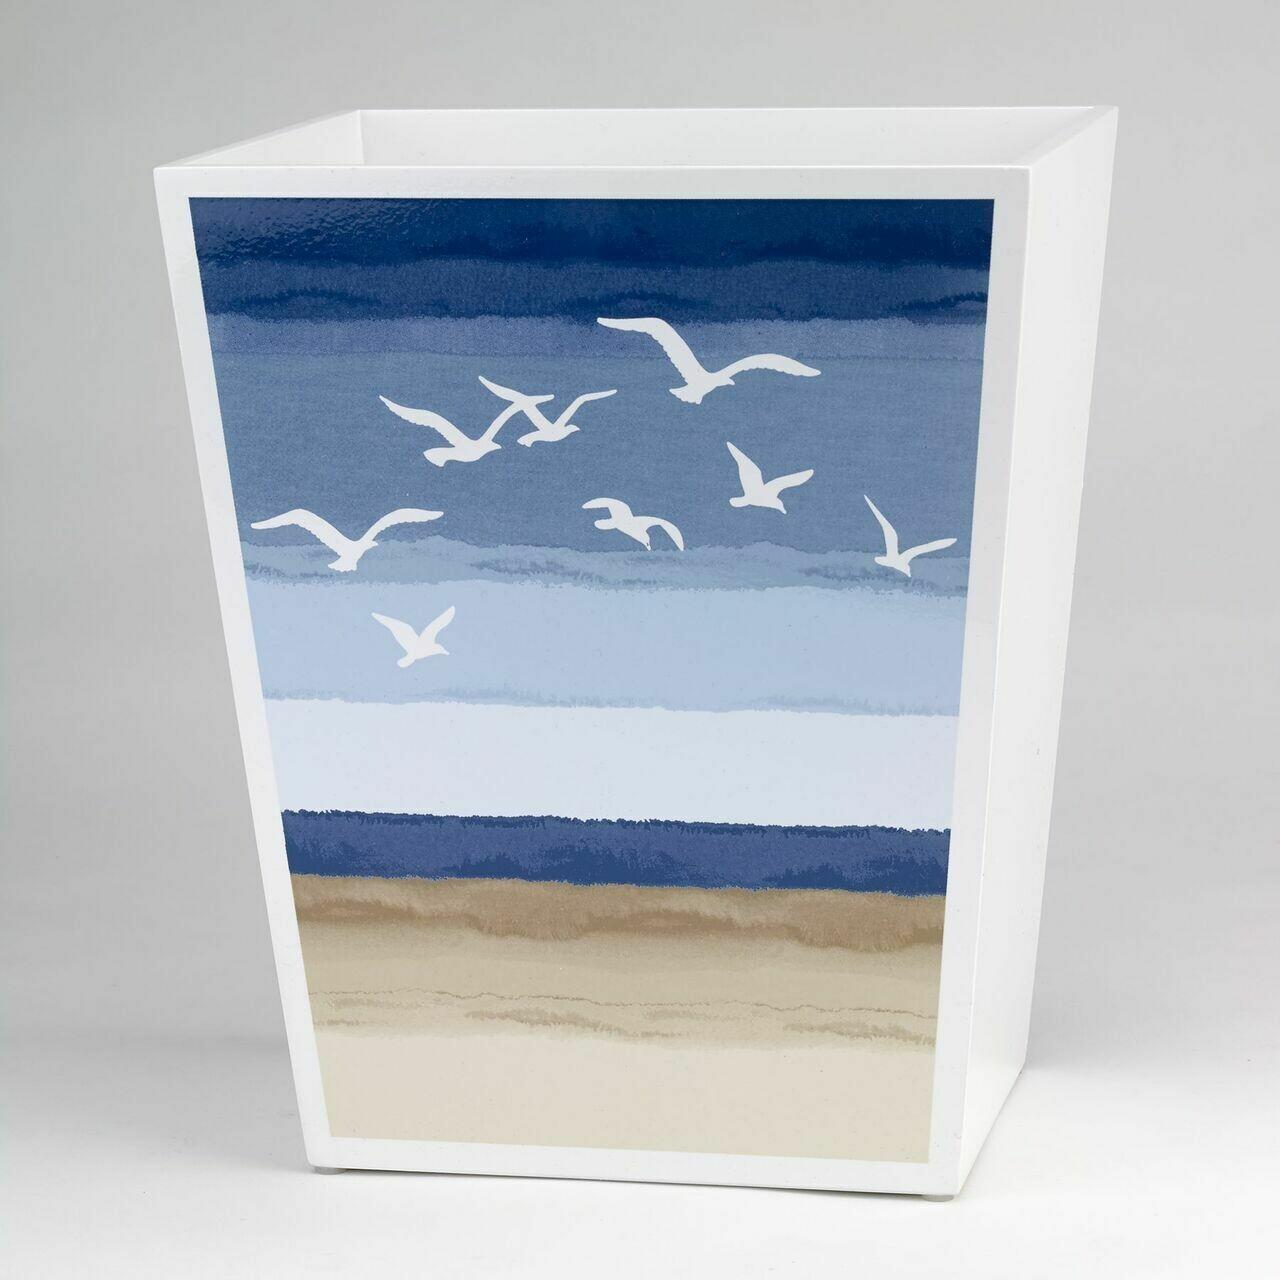 Seagulls Wastebasket